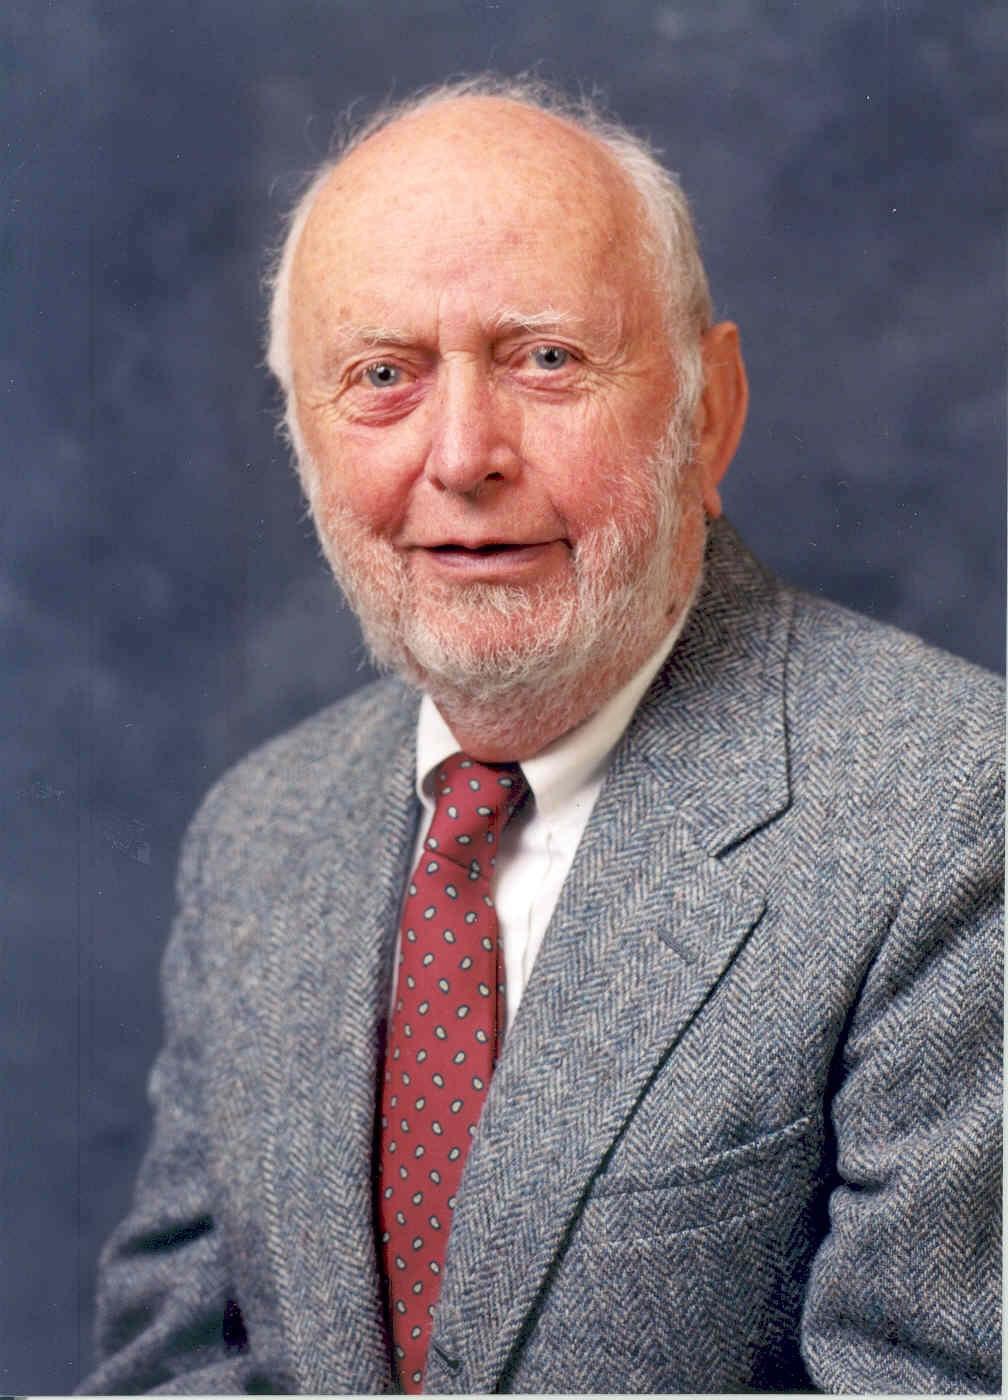 Professor Douglass C. North, 1993 Nobel Laureate in Economic Sciences